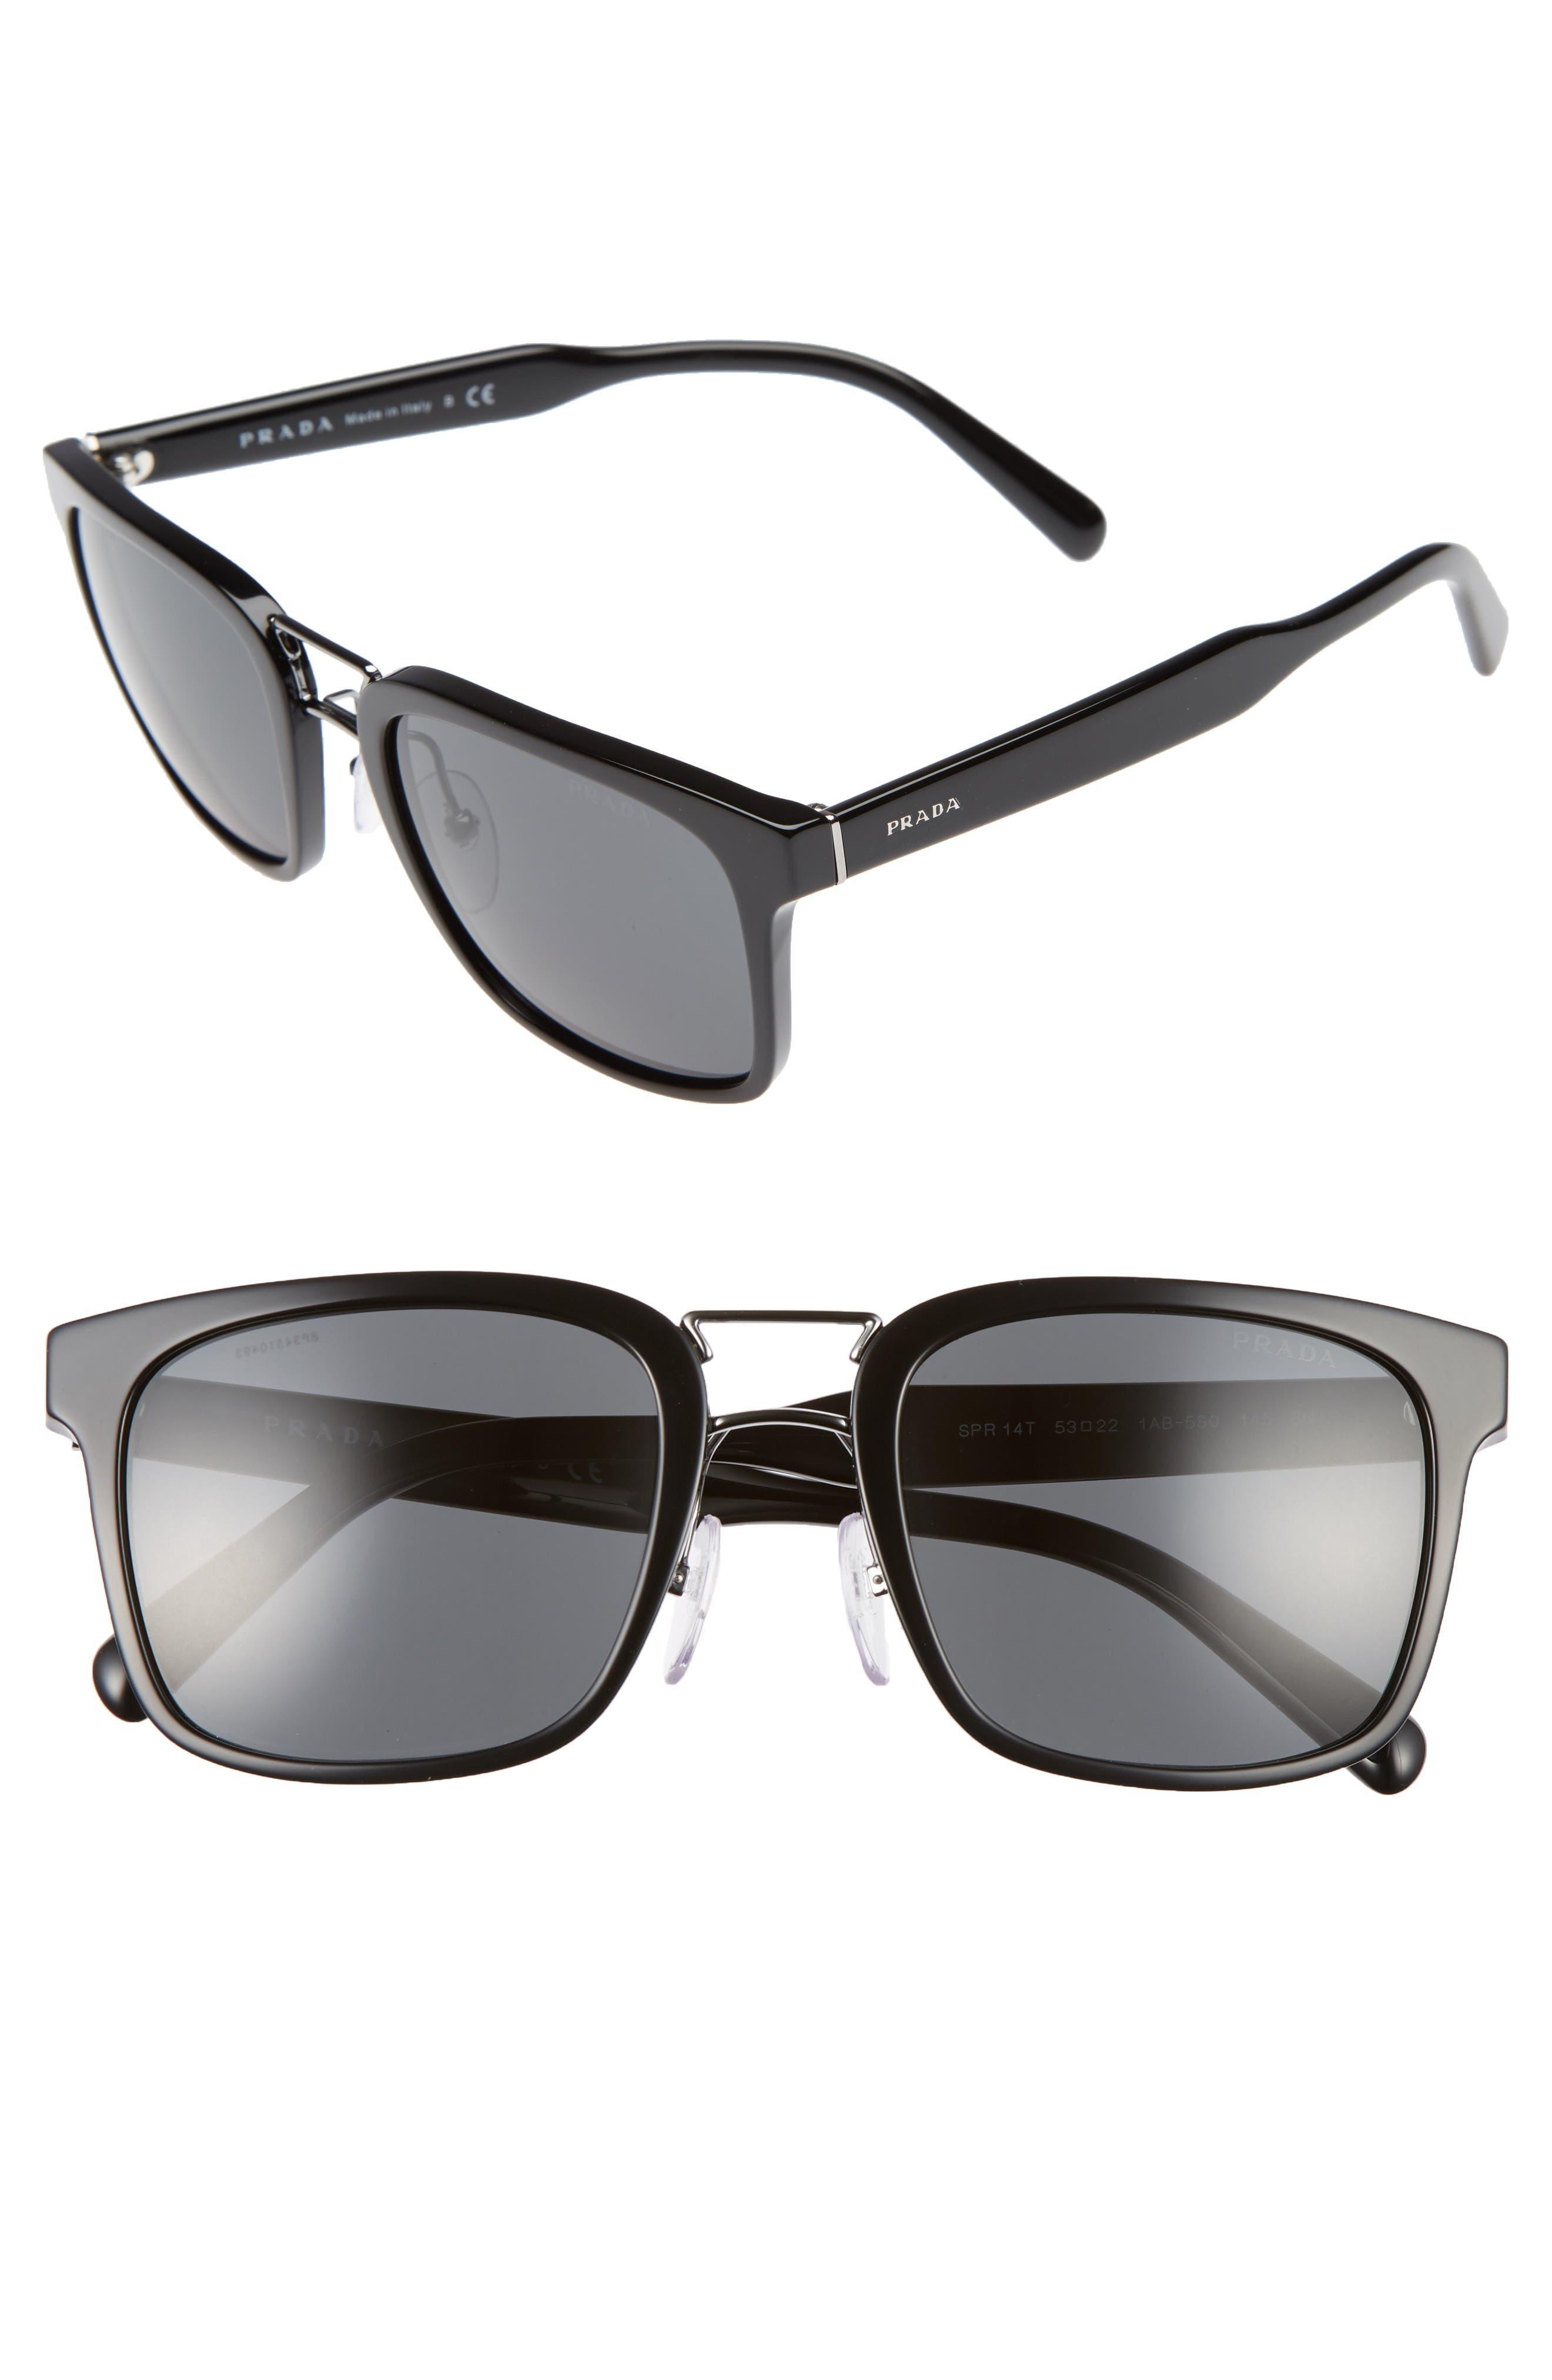 Prada 53mm Rectangle Sunglasses